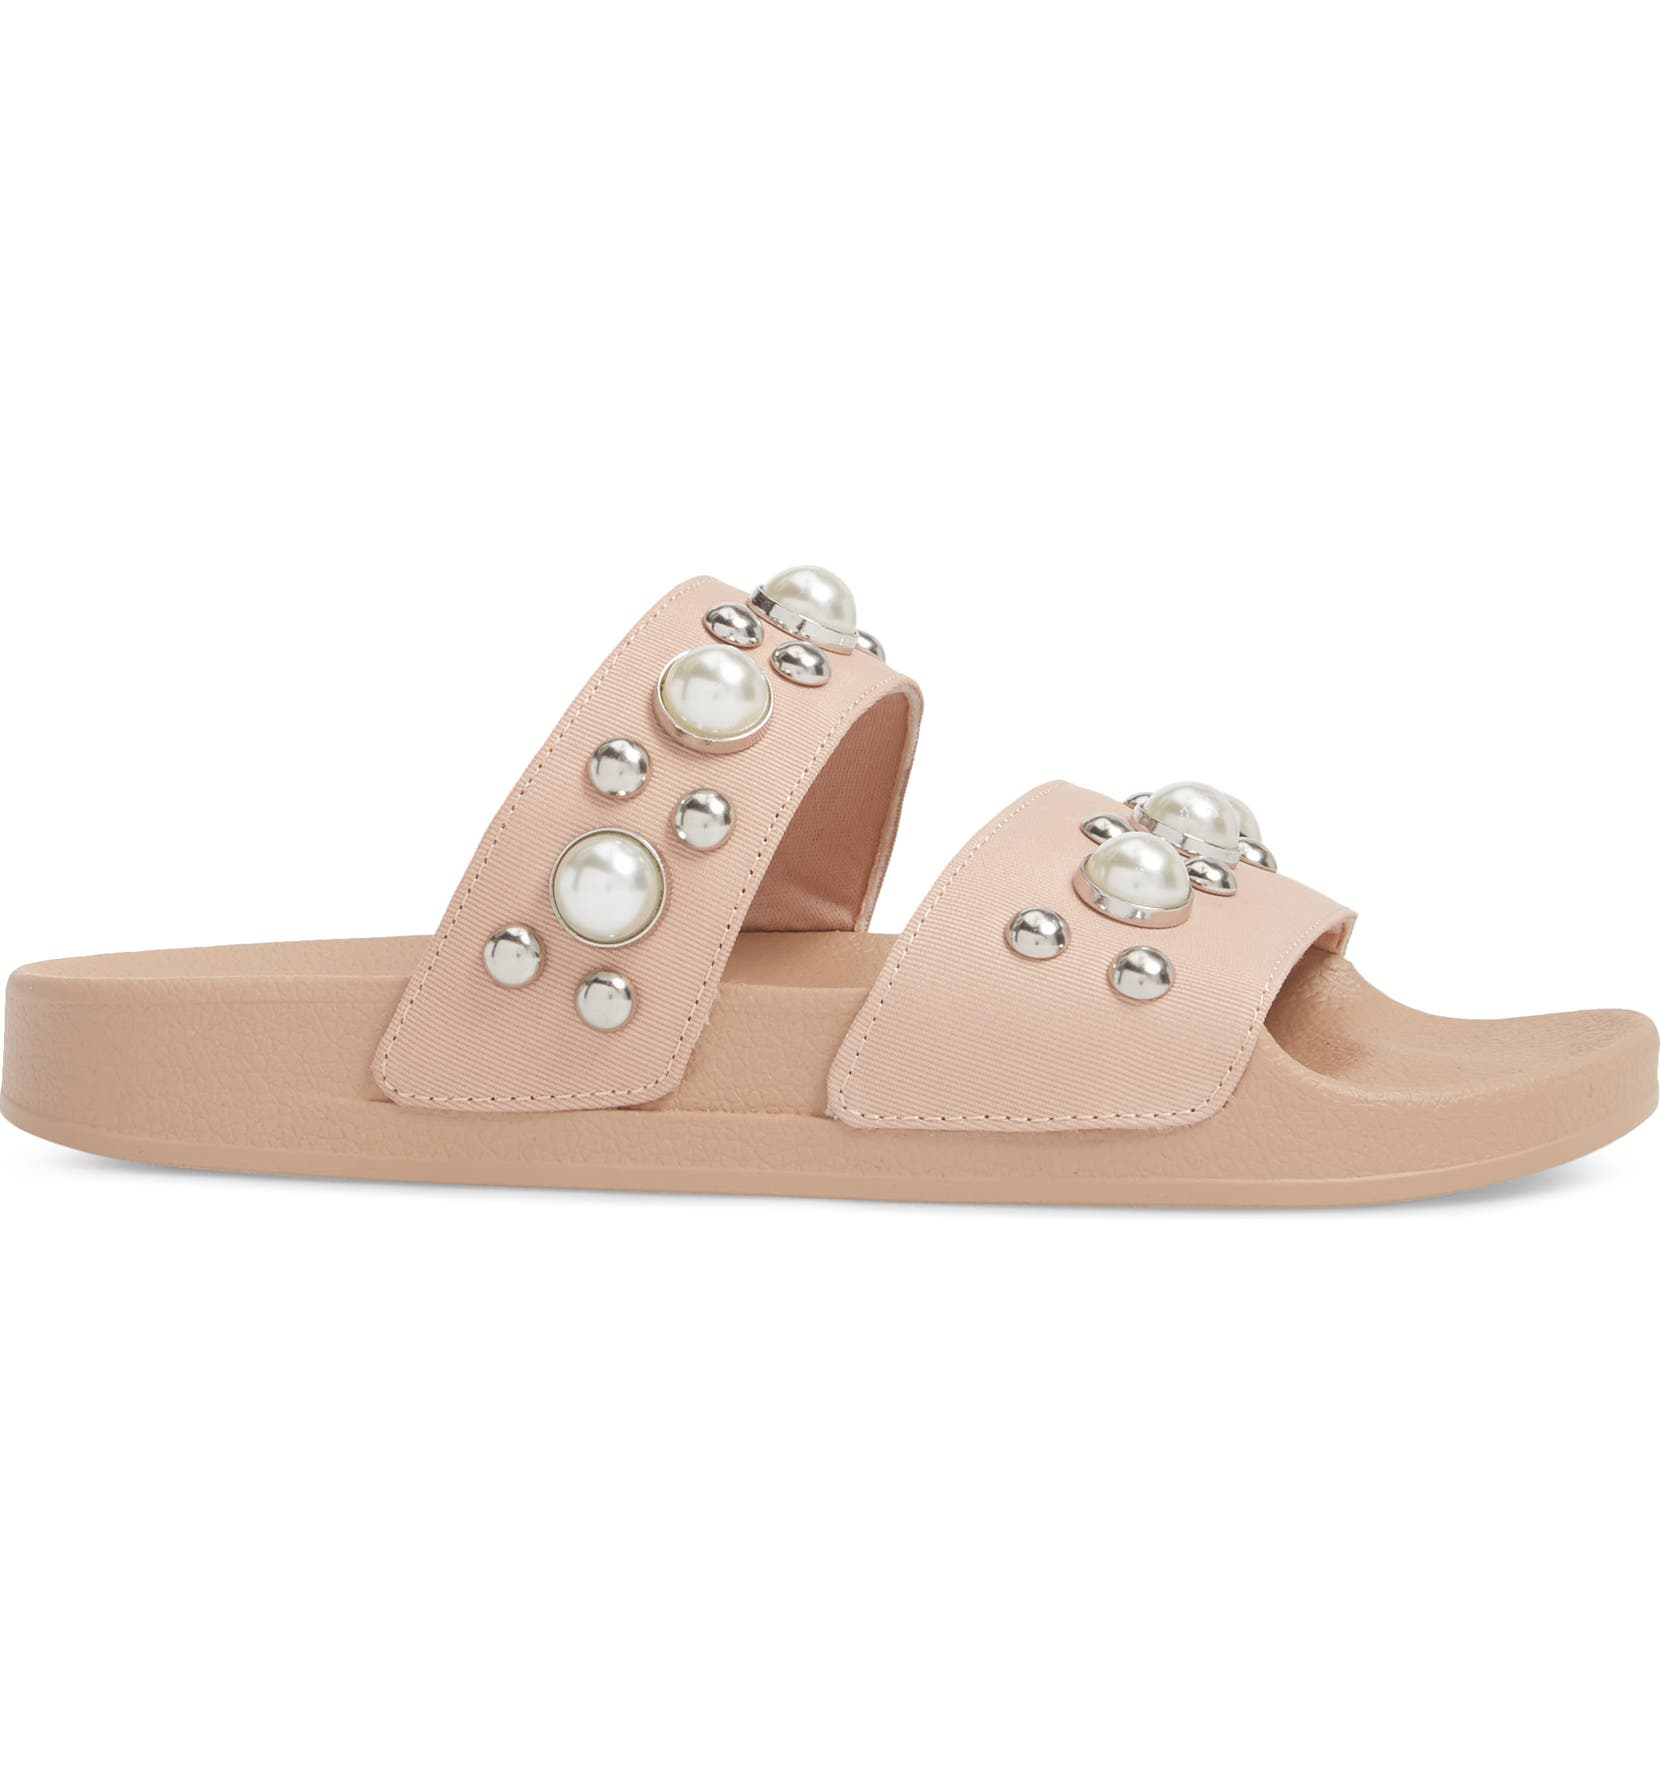 60a0d7e38774 Steve Madden Polite Embellished Slide Sandal (Women)